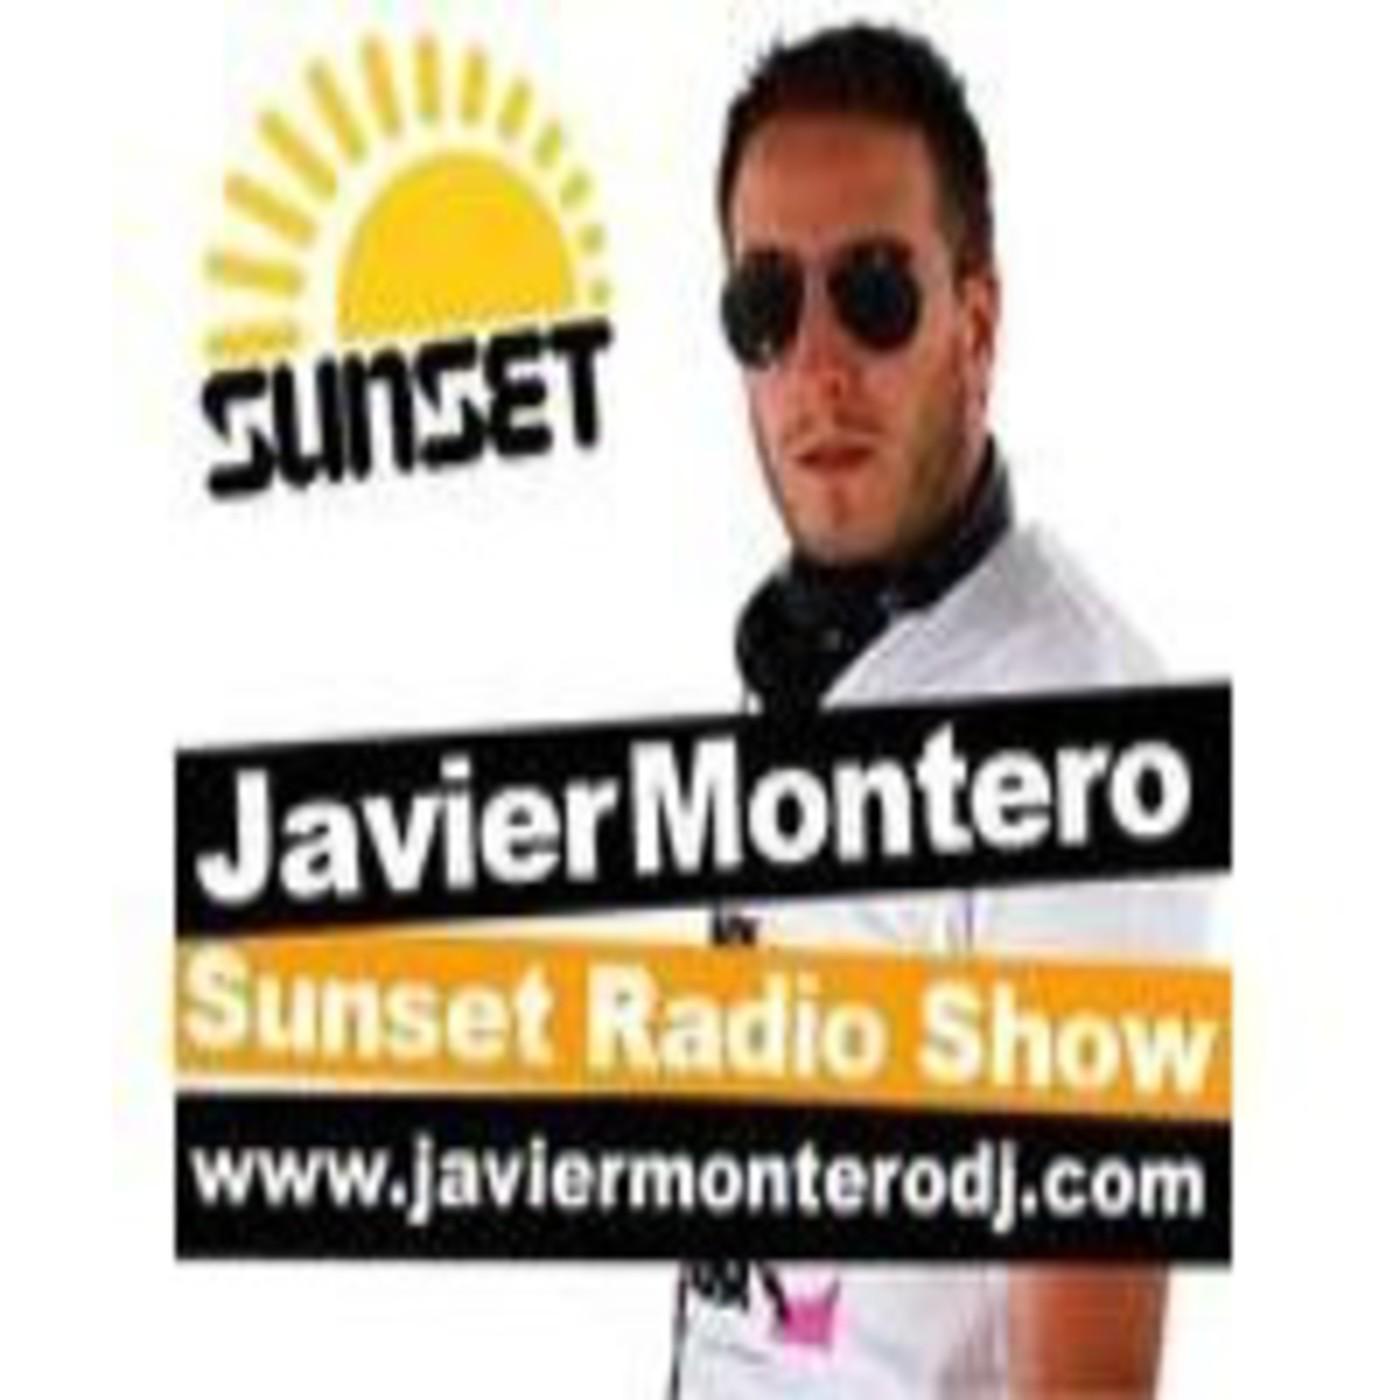 <![CDATA[SUNSET RADIO SHOW @JAVIER MONTERO]]>